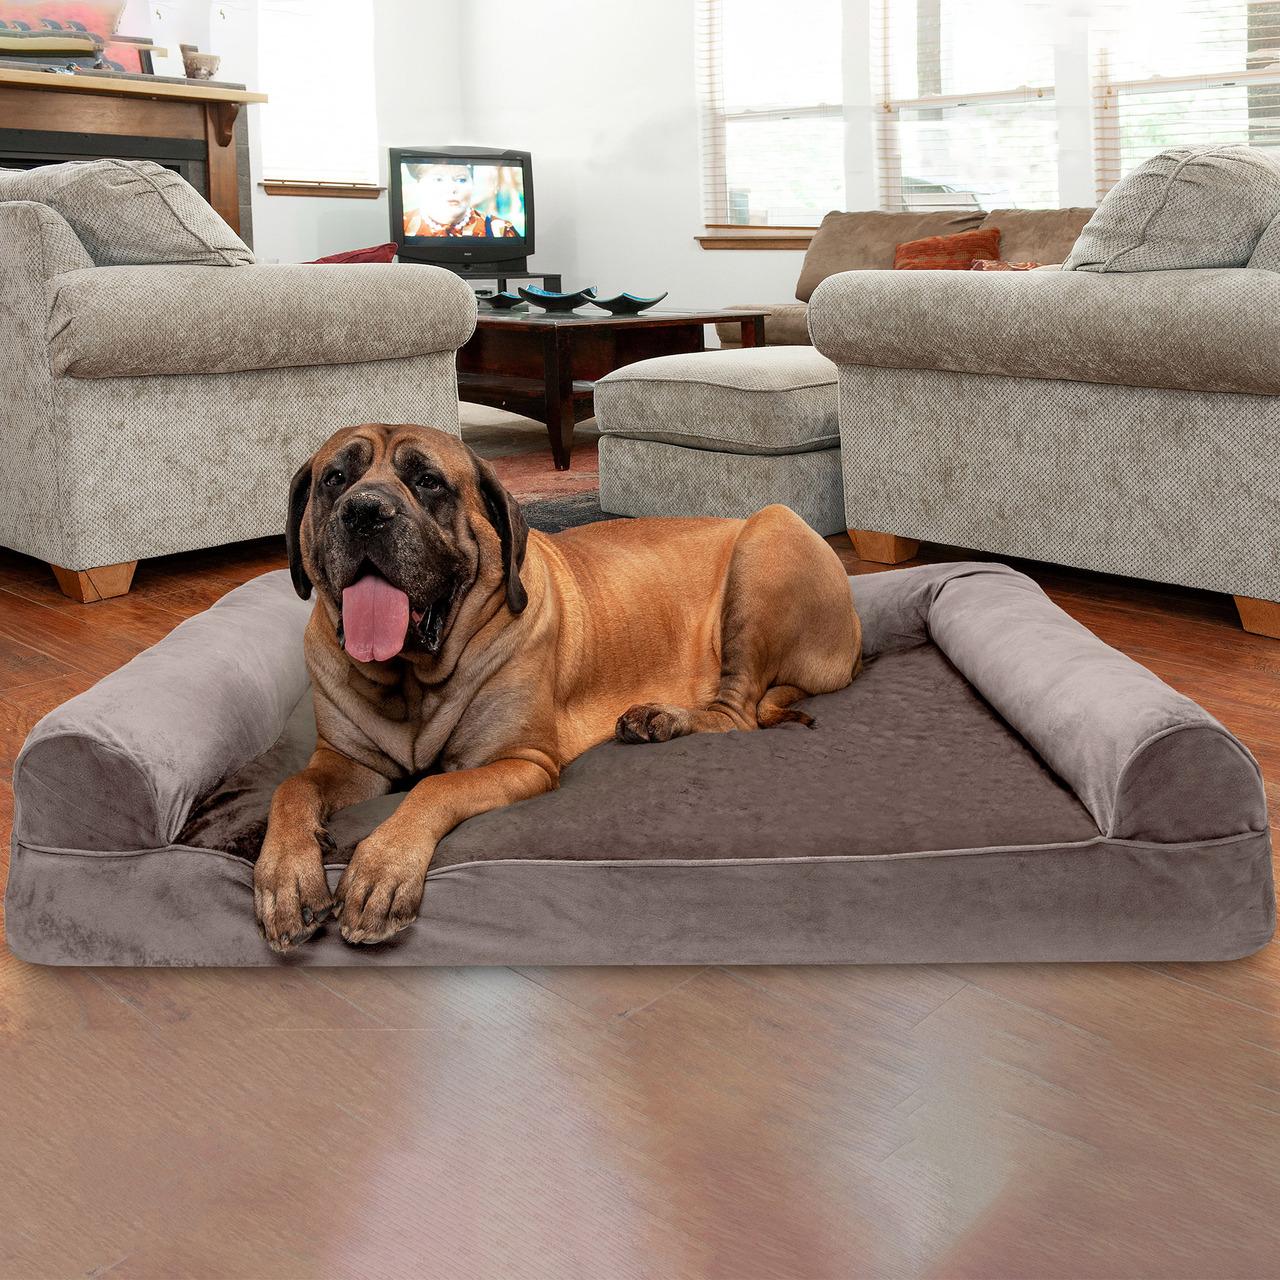 FURHAVEN PET Sofa Dog Bed with Cooling Gel Foam